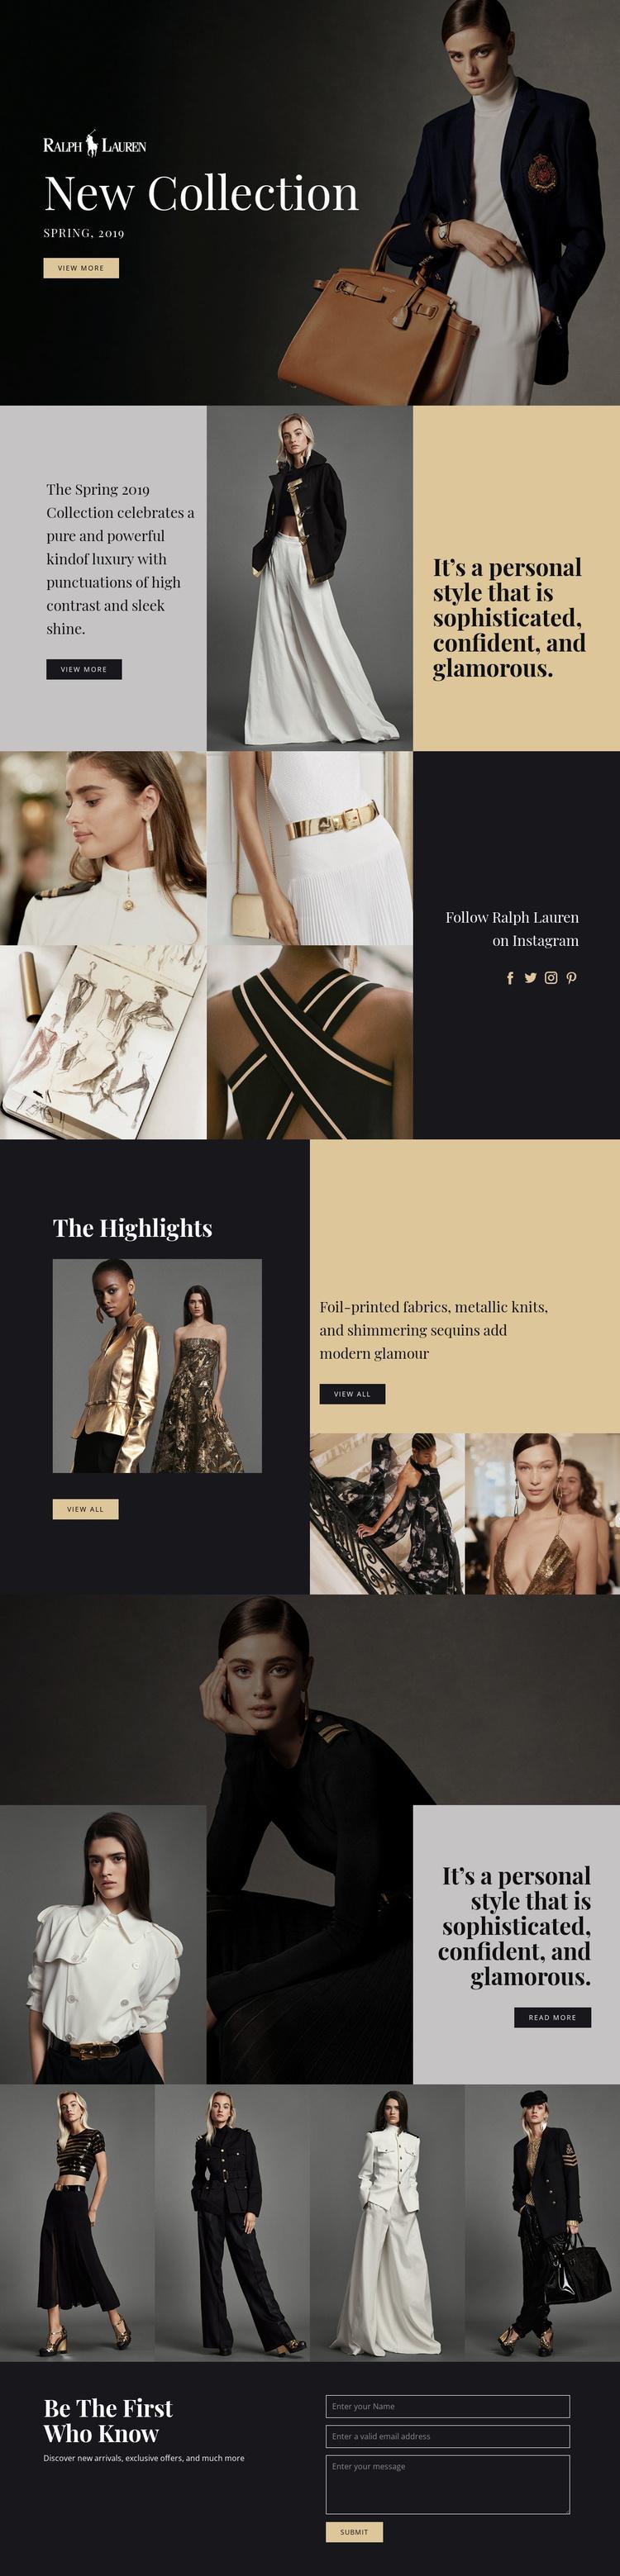 Ralph Lauren fashion Joomla Template